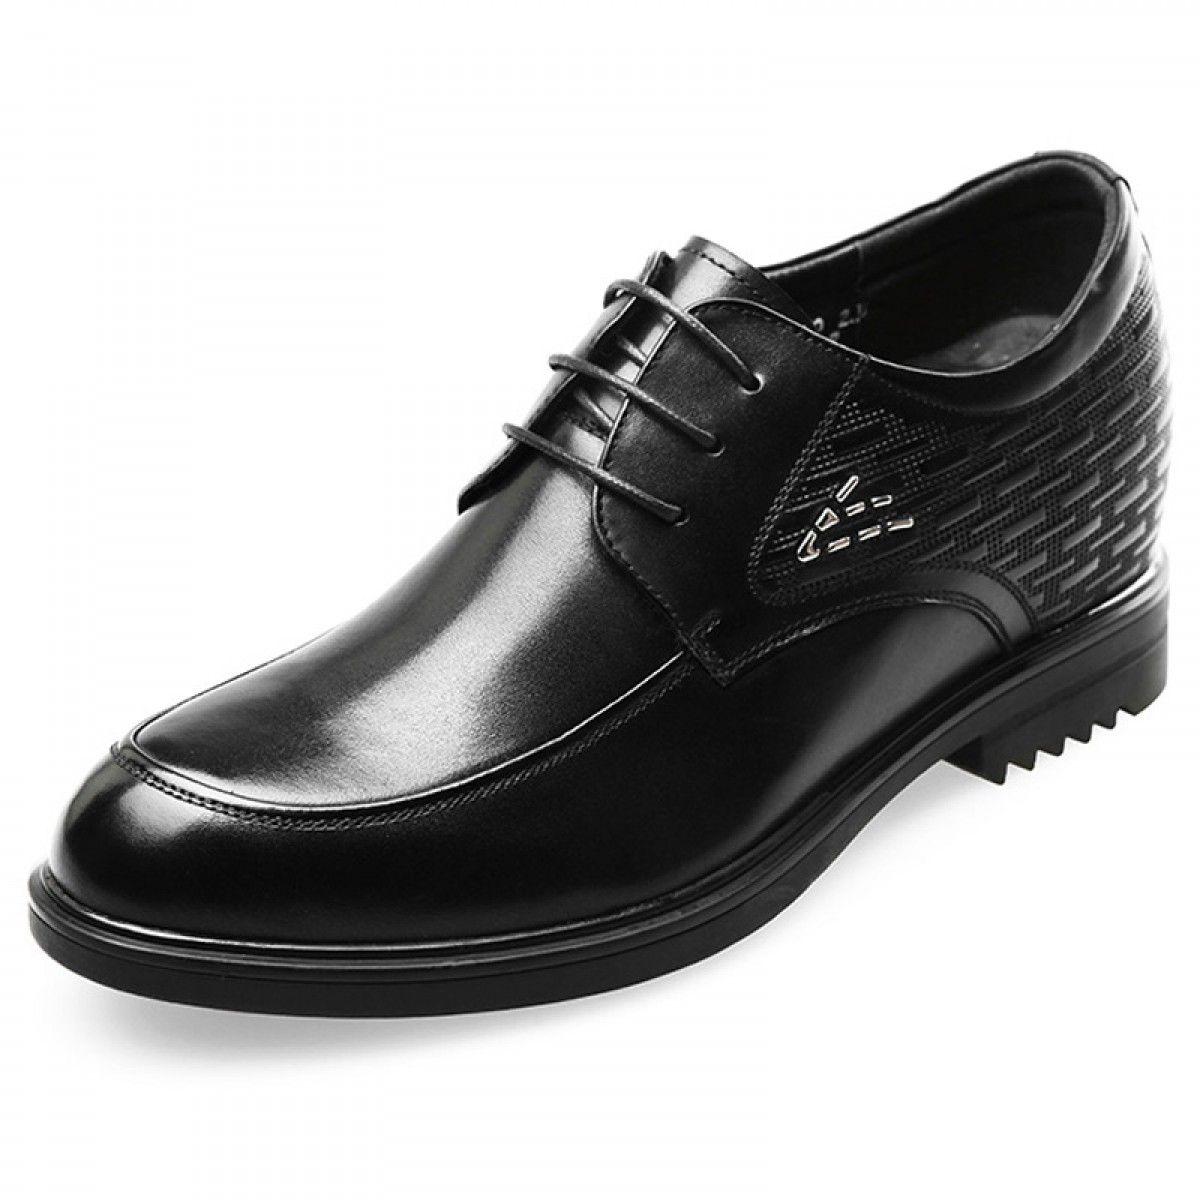 Premium Height Elevator Wedding Shoes Black Lace Up Formal Derbies Men 00453 01 Dress Shoes Men Shoes Mens Shoes With Shorts